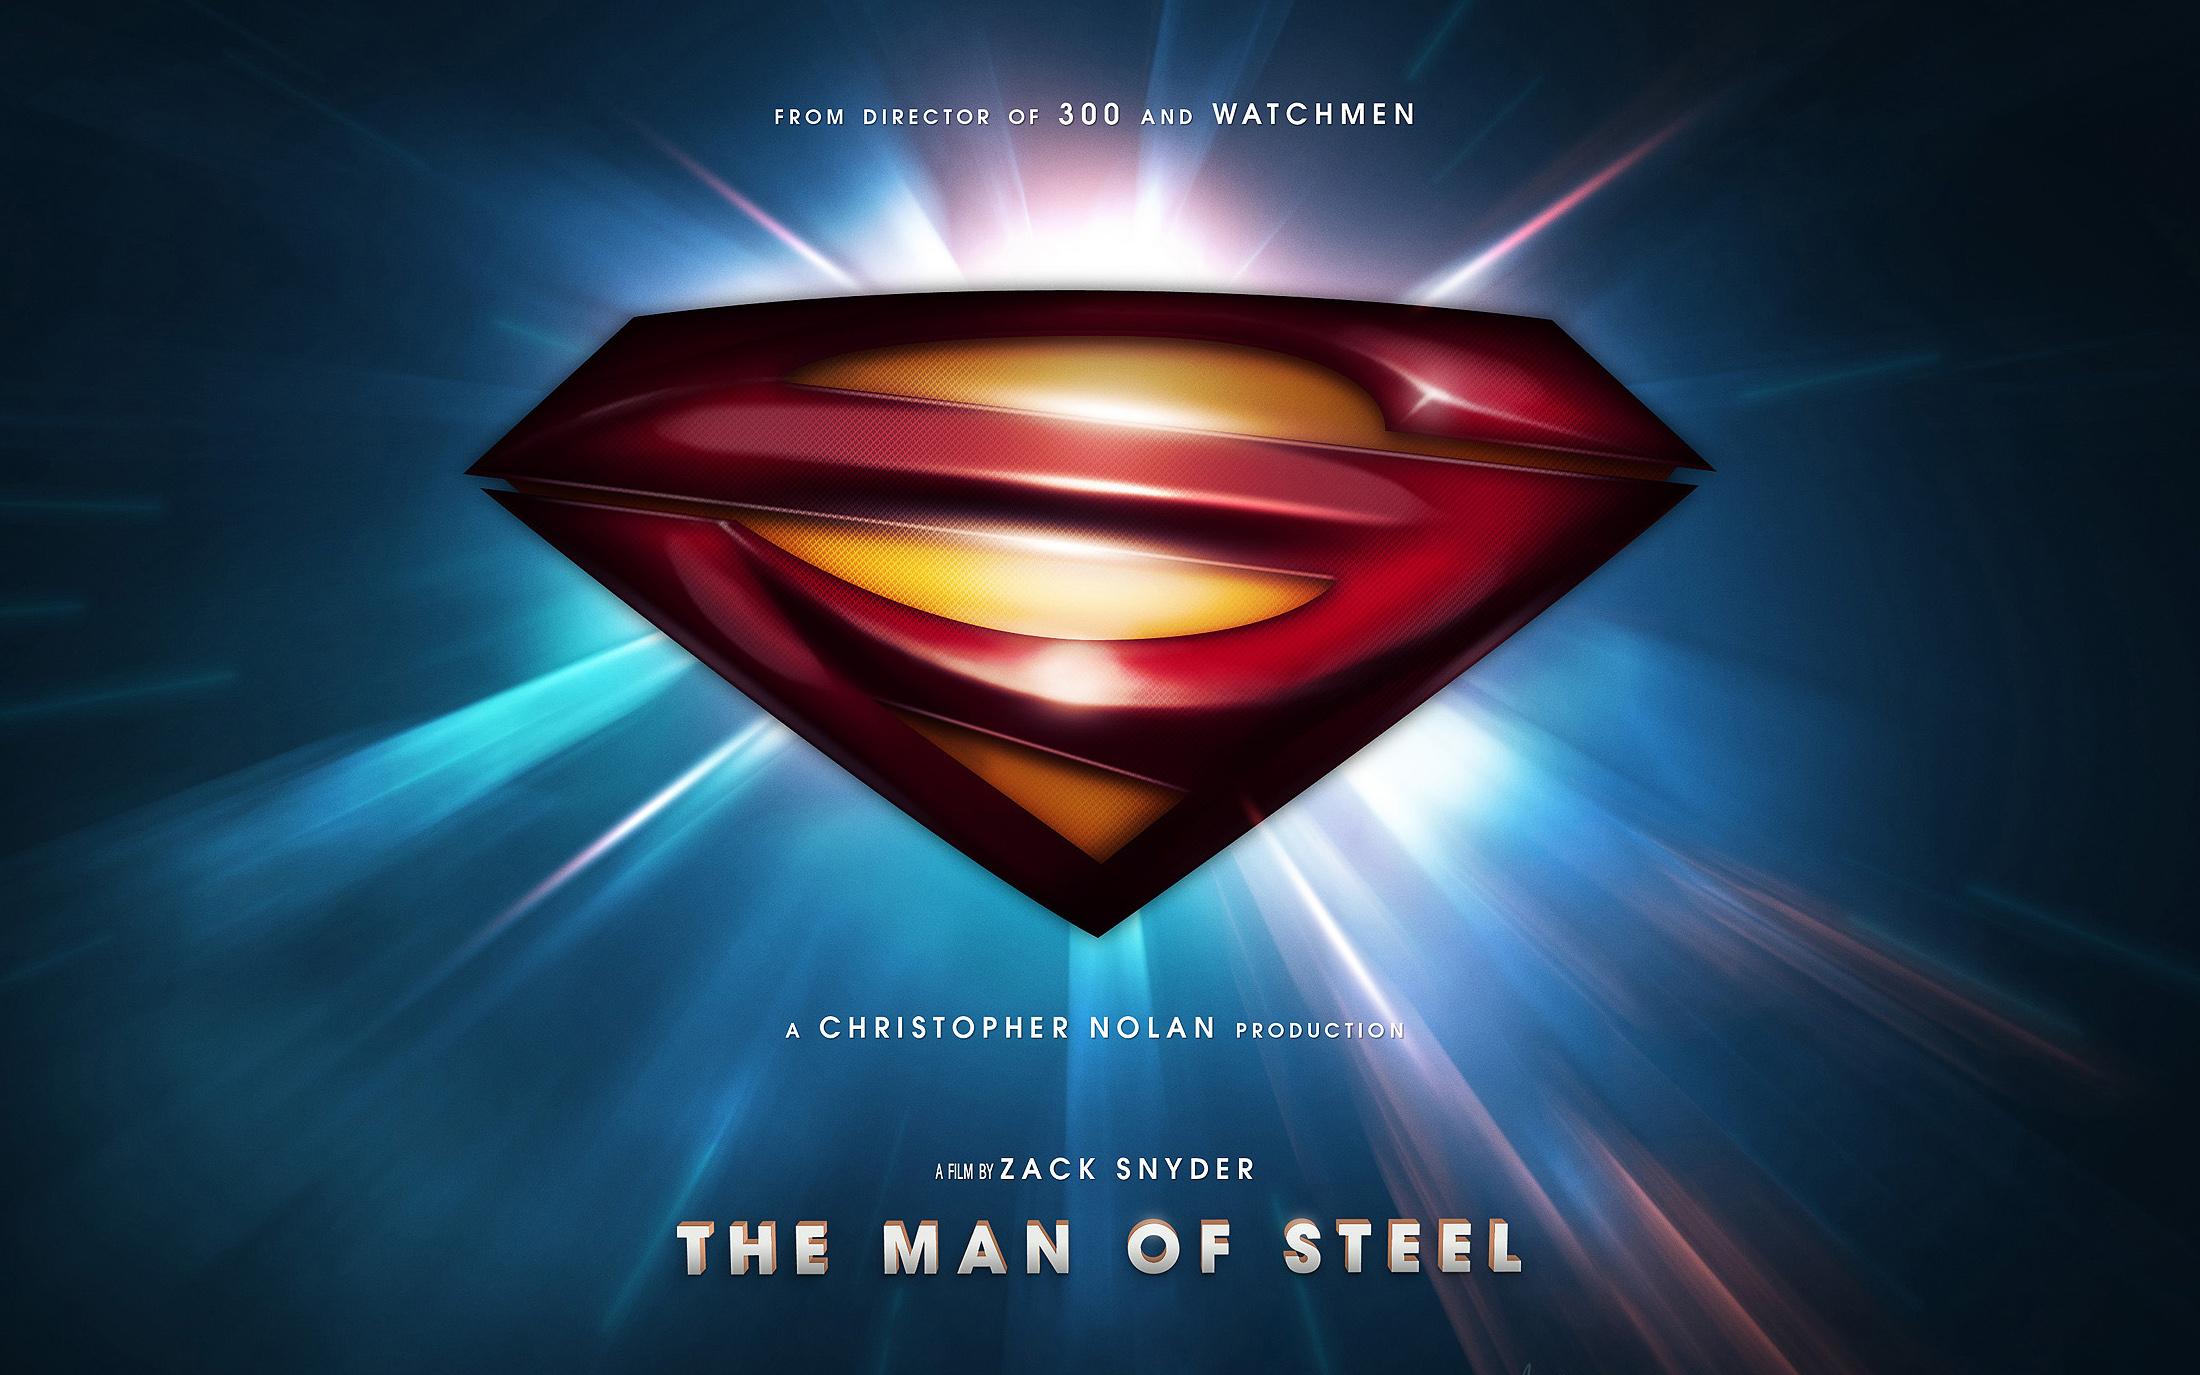 Superman Man of Steel 2013 Wallpapers HD Wallpapers 2200x1375